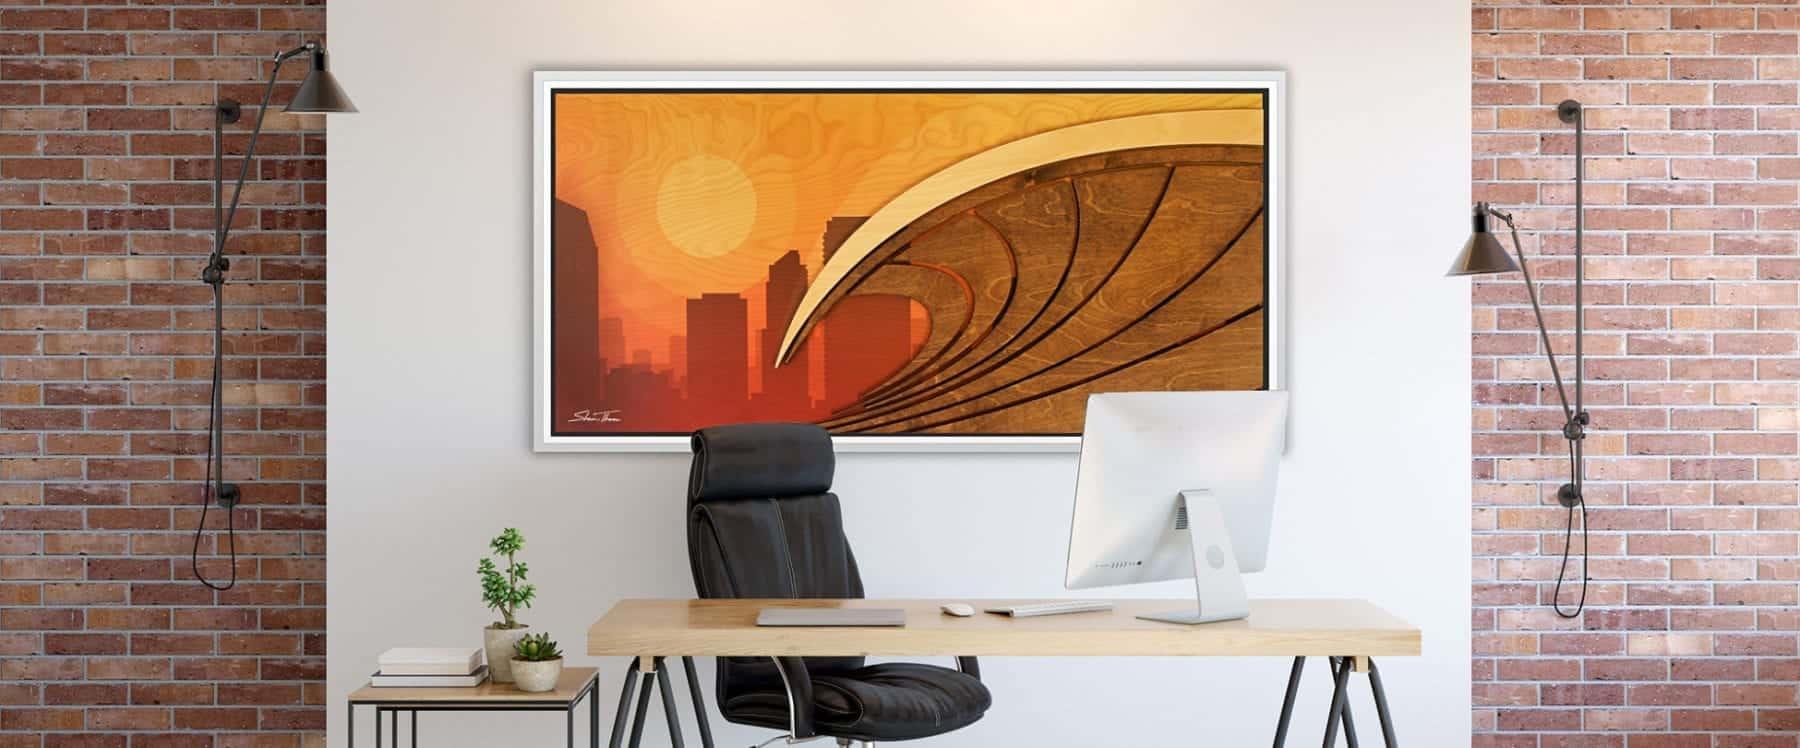 San Diego Surf Art | Wood Beach Wall Art | Wave Gallery